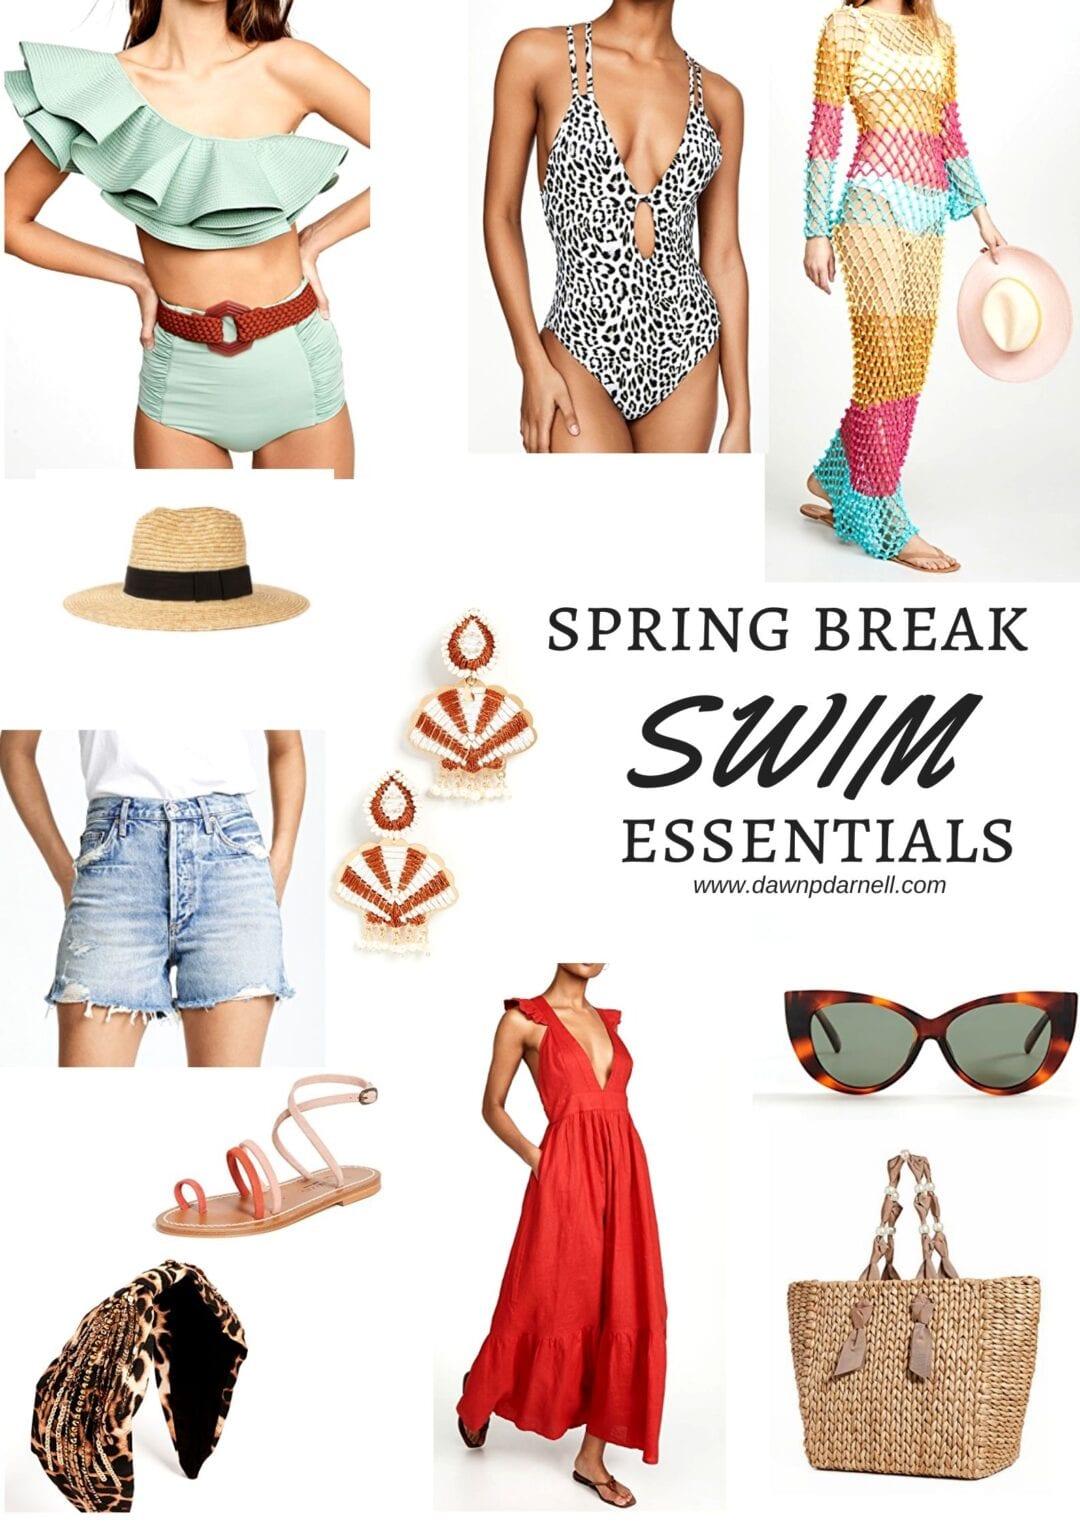 Shopbop, spring sale, spring break, swimsuit, swim essentials, beach bag, cat eye sunglasses, cut off shorts